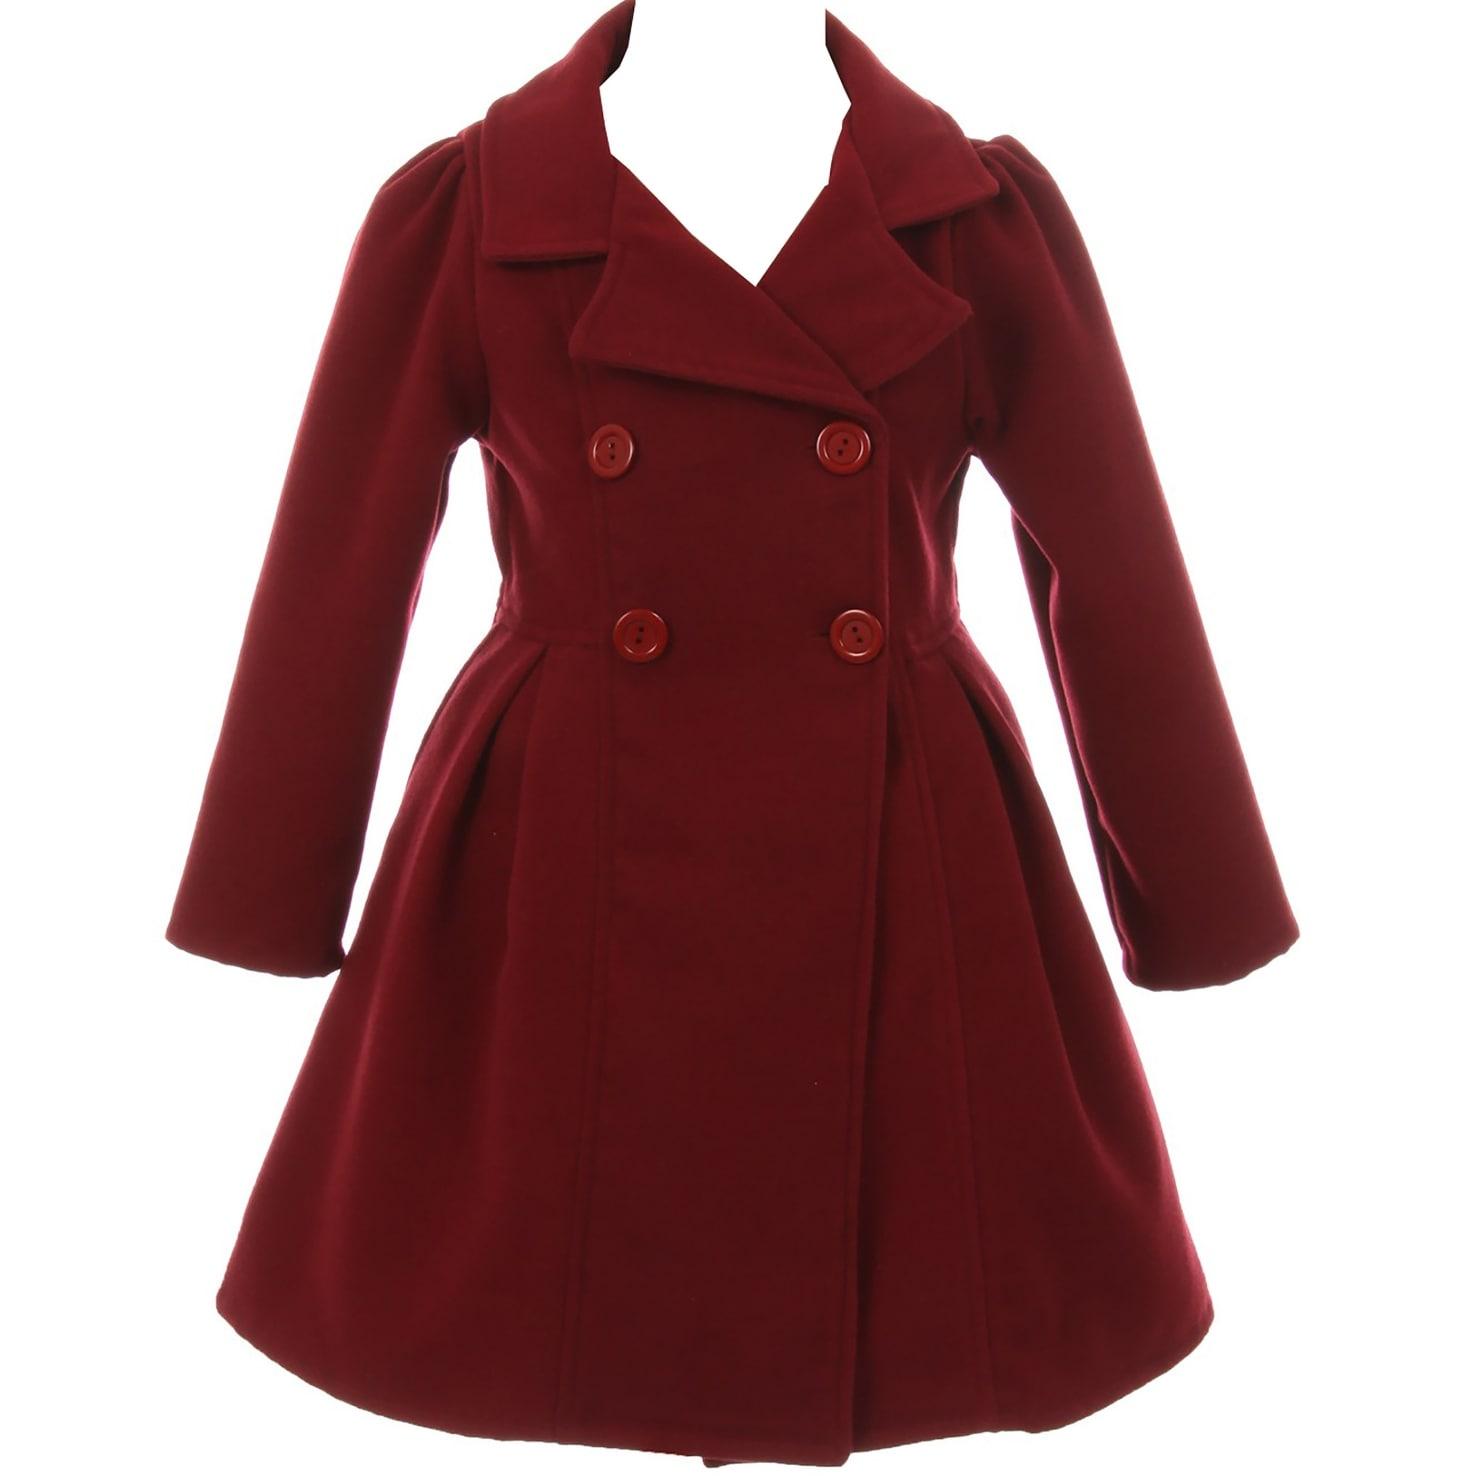 shop black friday deals on flower girls winter clothes long coat outerwear burgundy overstock 18157955 flower girls winter clothes long coat outerwear burgundy